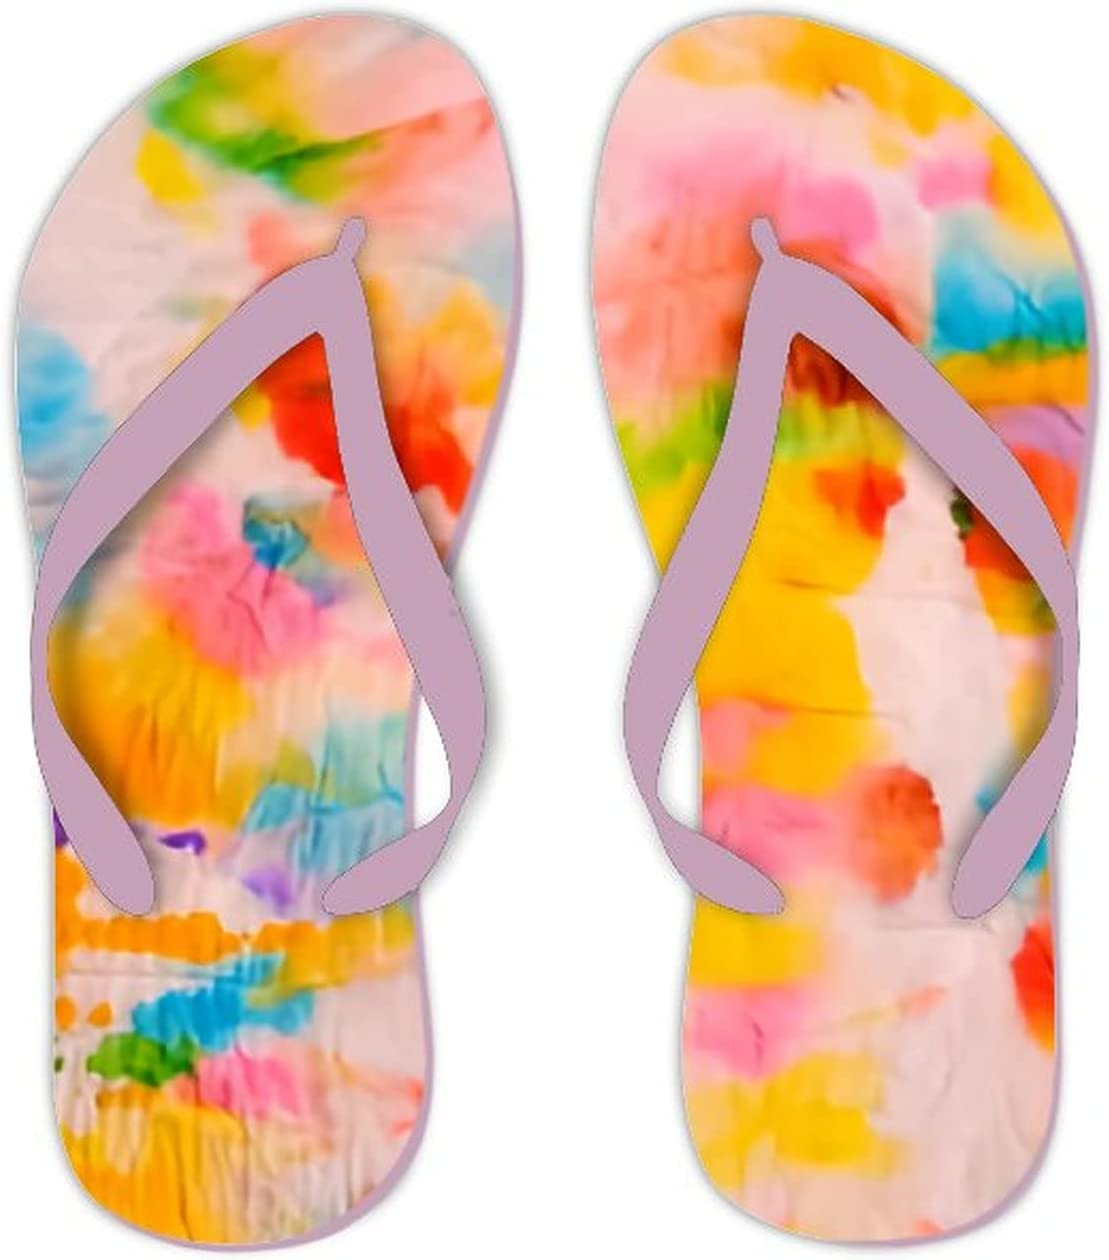 UTF4C Summer Flip Flops for Men Women Colorful Abstract tie dye Pattern Soft Lightweight Non Slip Sandals for Shower Beach Pool Bathroom Flat 9